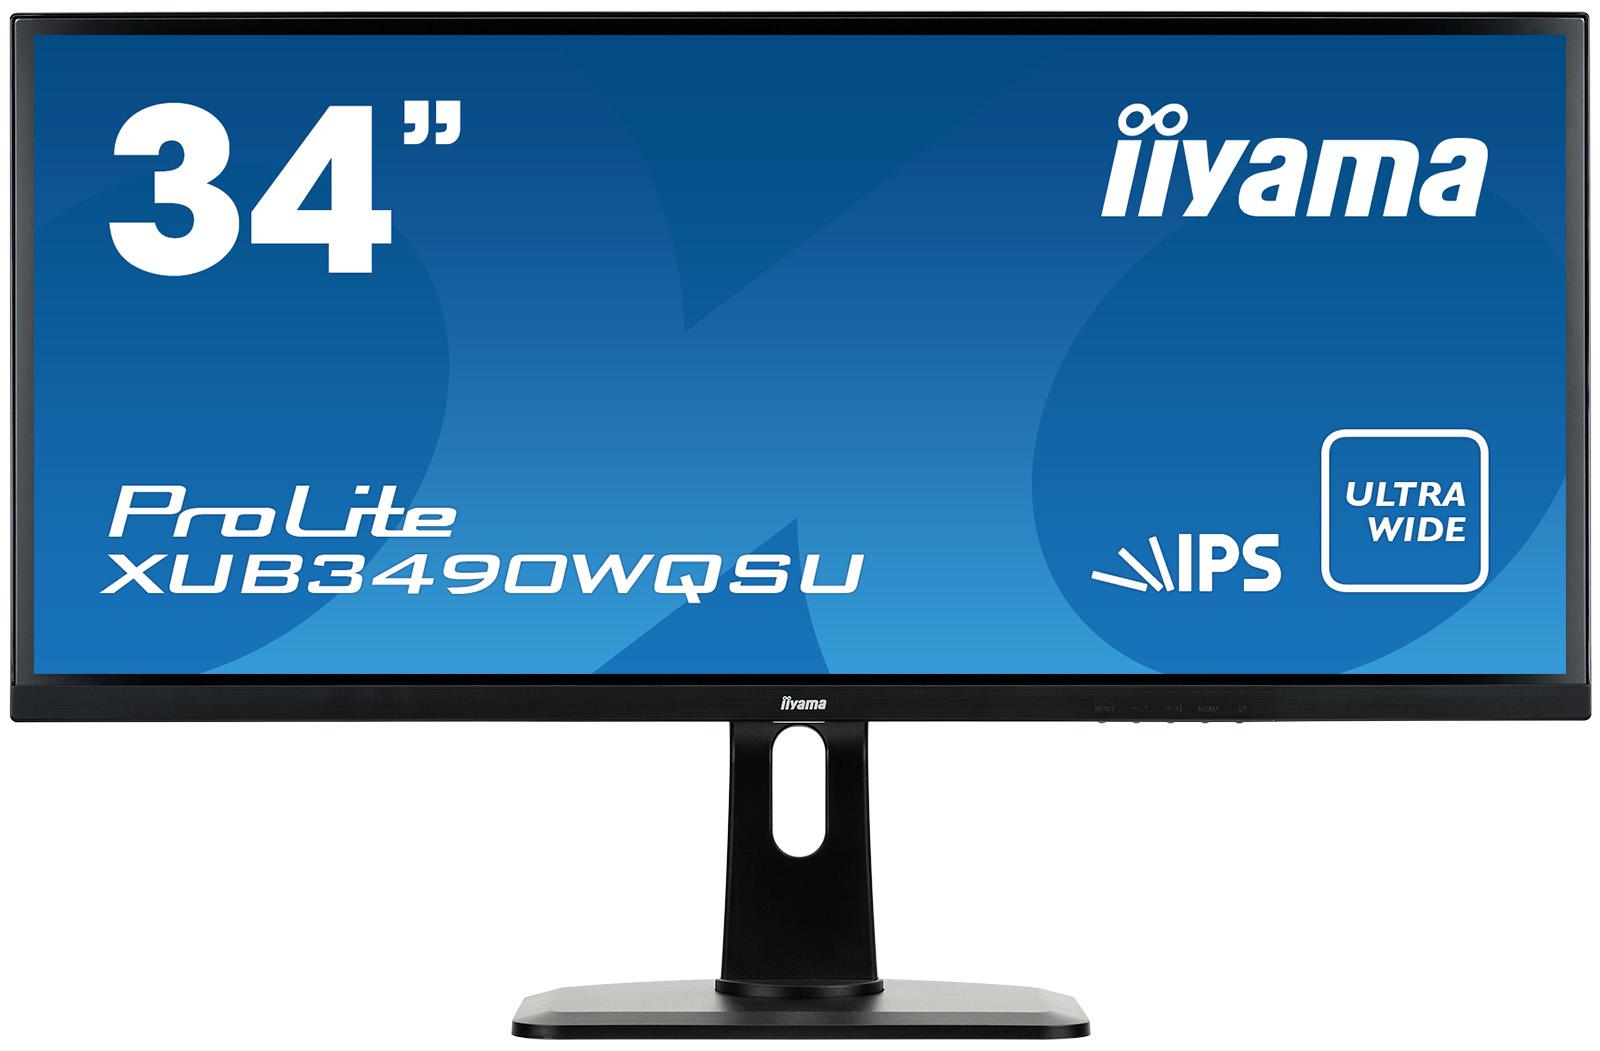 Iiyama ProLite XUB3490WQSU-B1 - LED-Monitor - 86.7 cm (34)